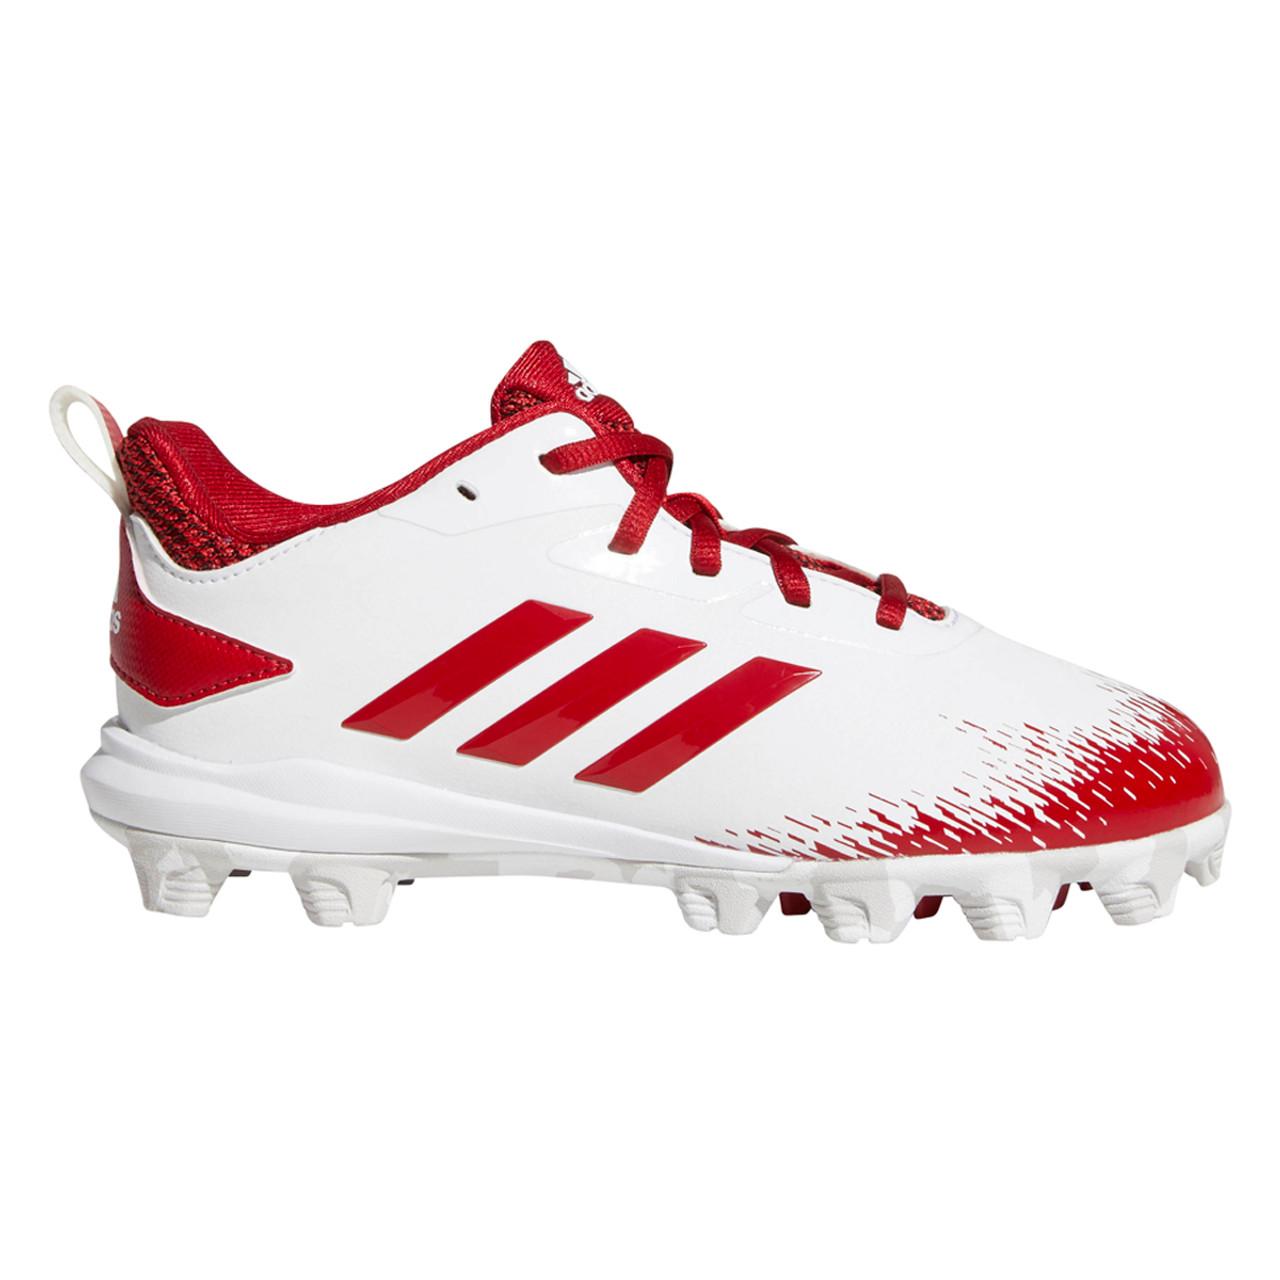 finest selection b14ab 3b252 Adidas Adizero Afterburner V MD Youth Baseball Cleats CG5238 ...